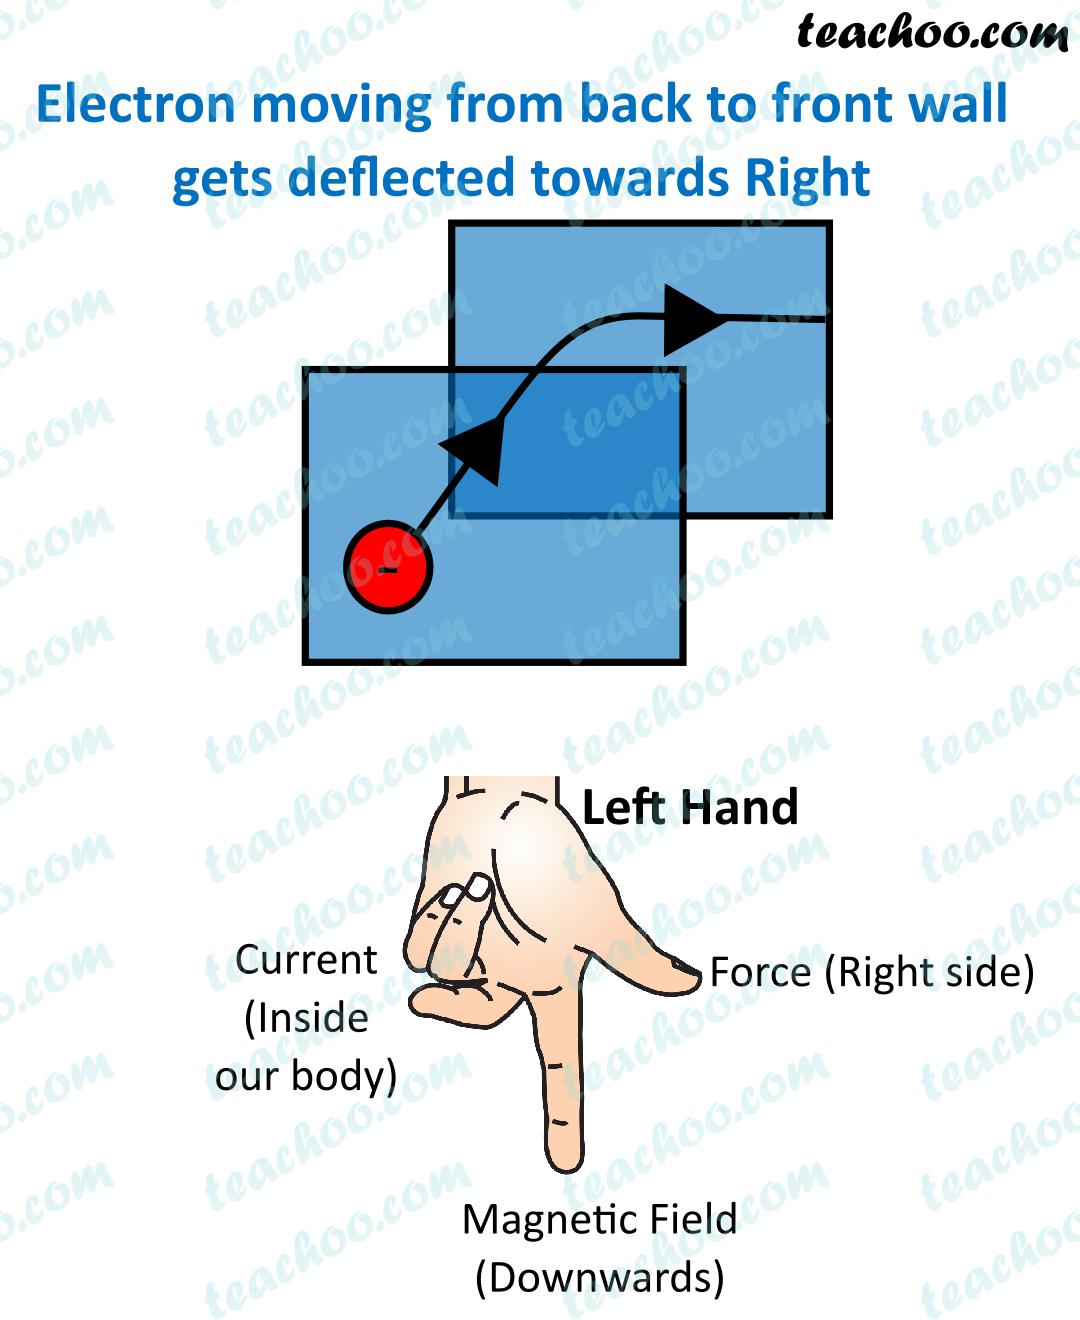 ncert-question-10---answer---chapter-13-class-10-magnetic-field---teachoo.jpg